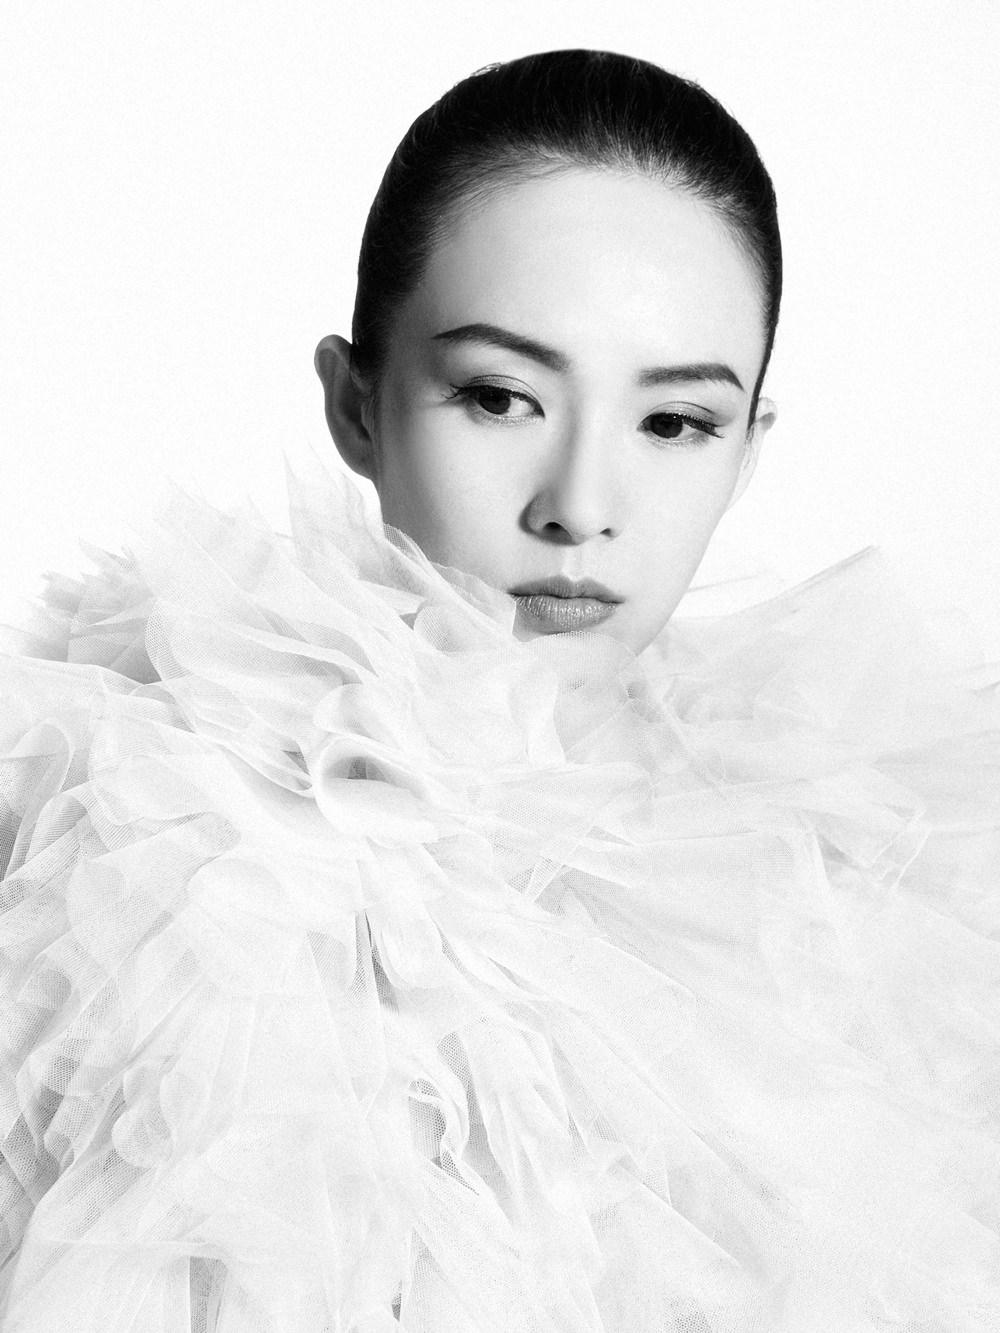 Dazzling Actress Zhang Ziyi starring in John Woo's much-awaited drama The Crossing